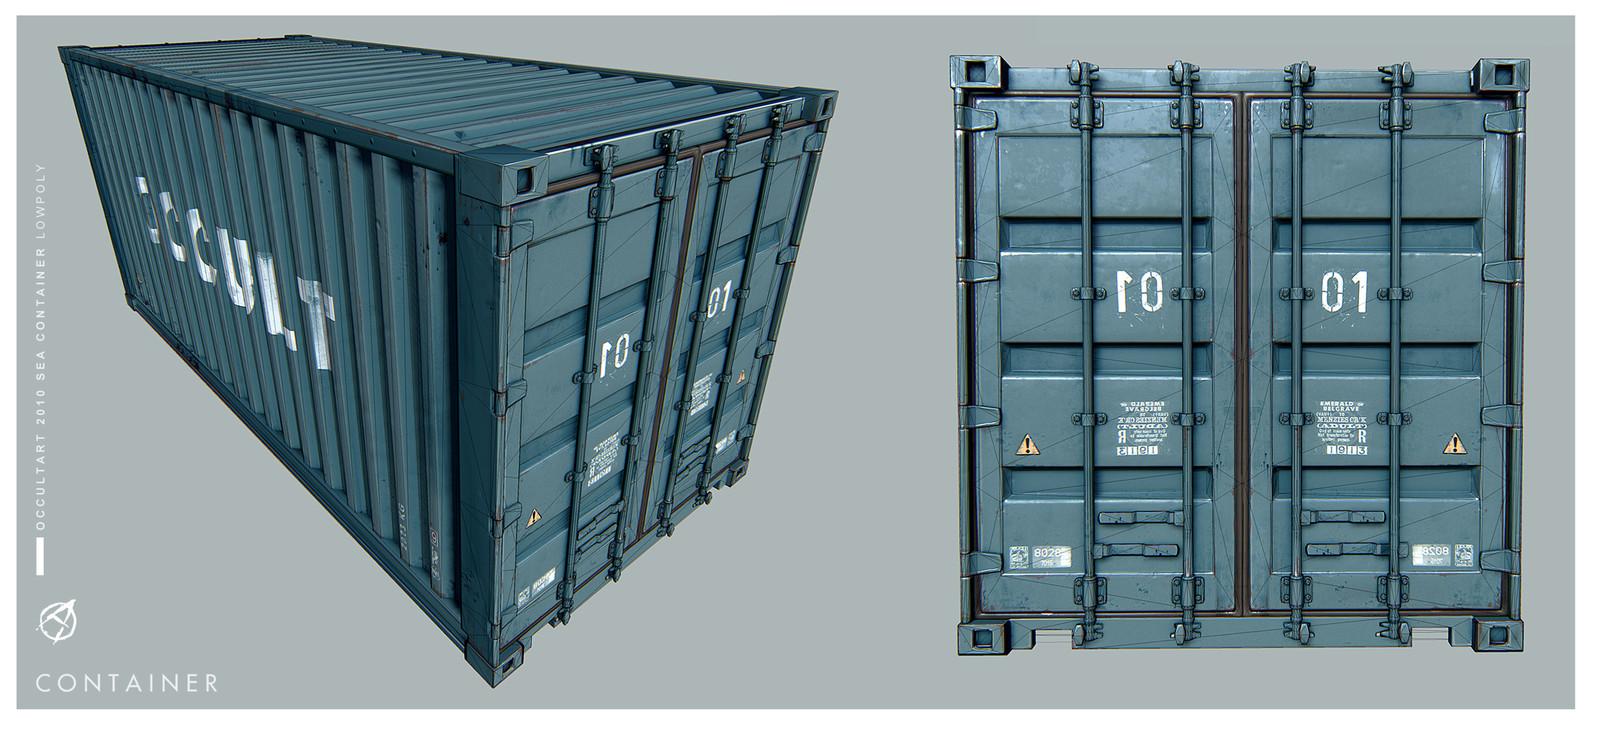 Sea Container 2010